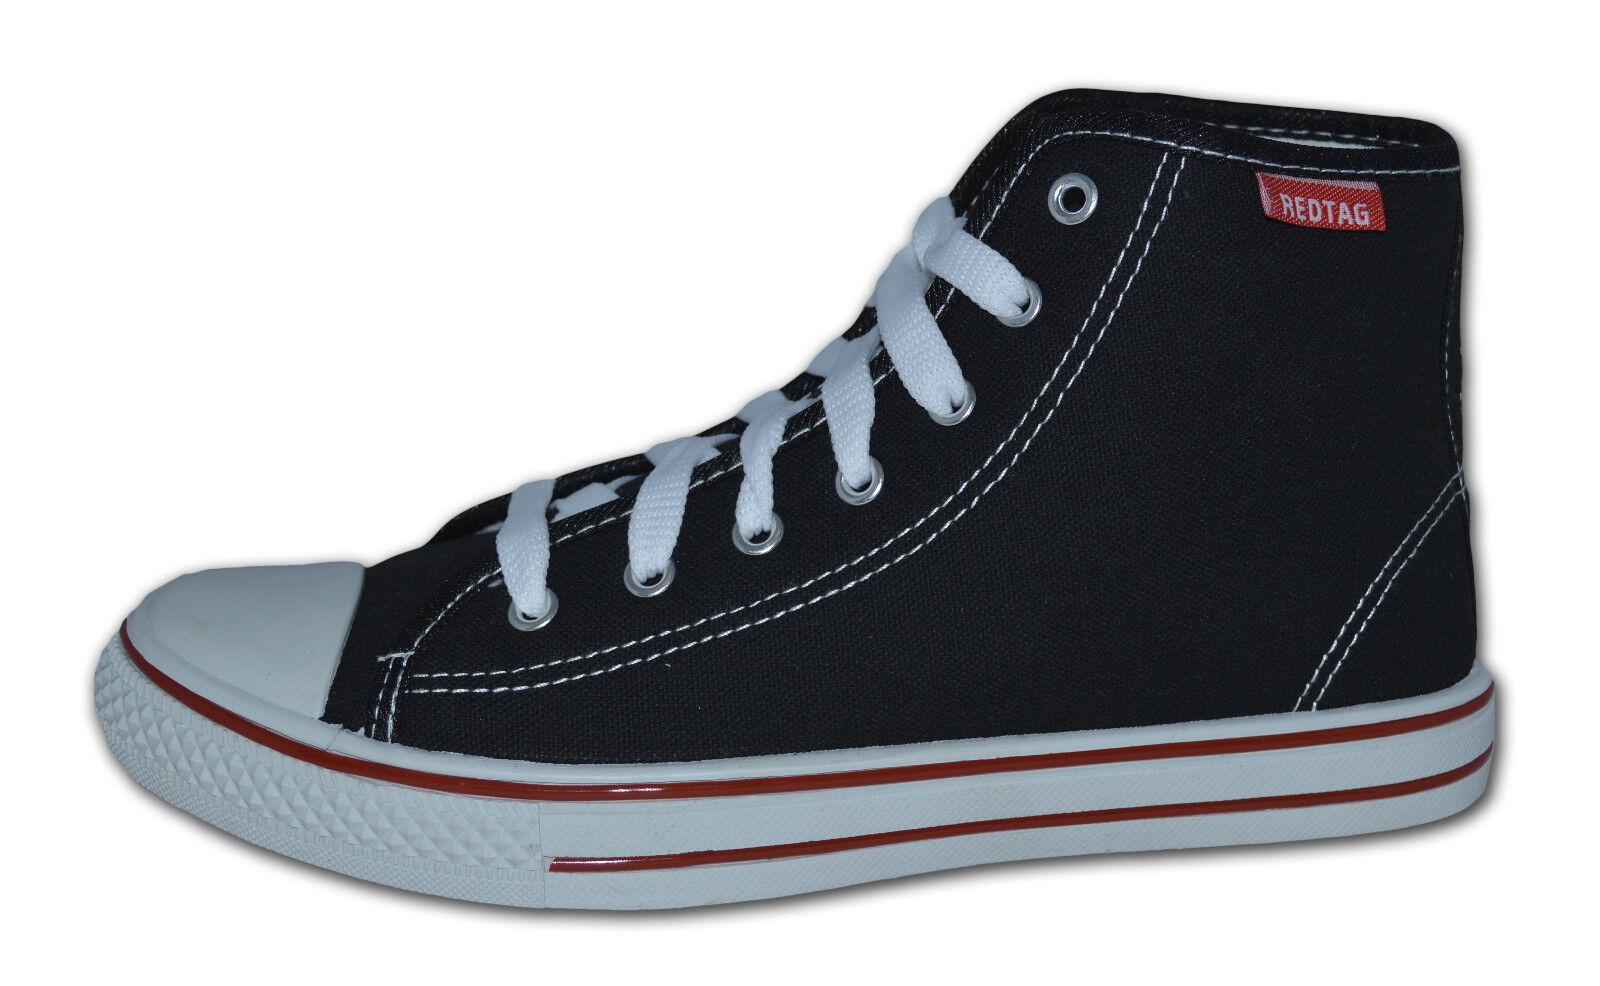 Ladies/Womens Canvas Boots, Ankle High Pumps, Black,Size 8 (EUR42) Free Postage!